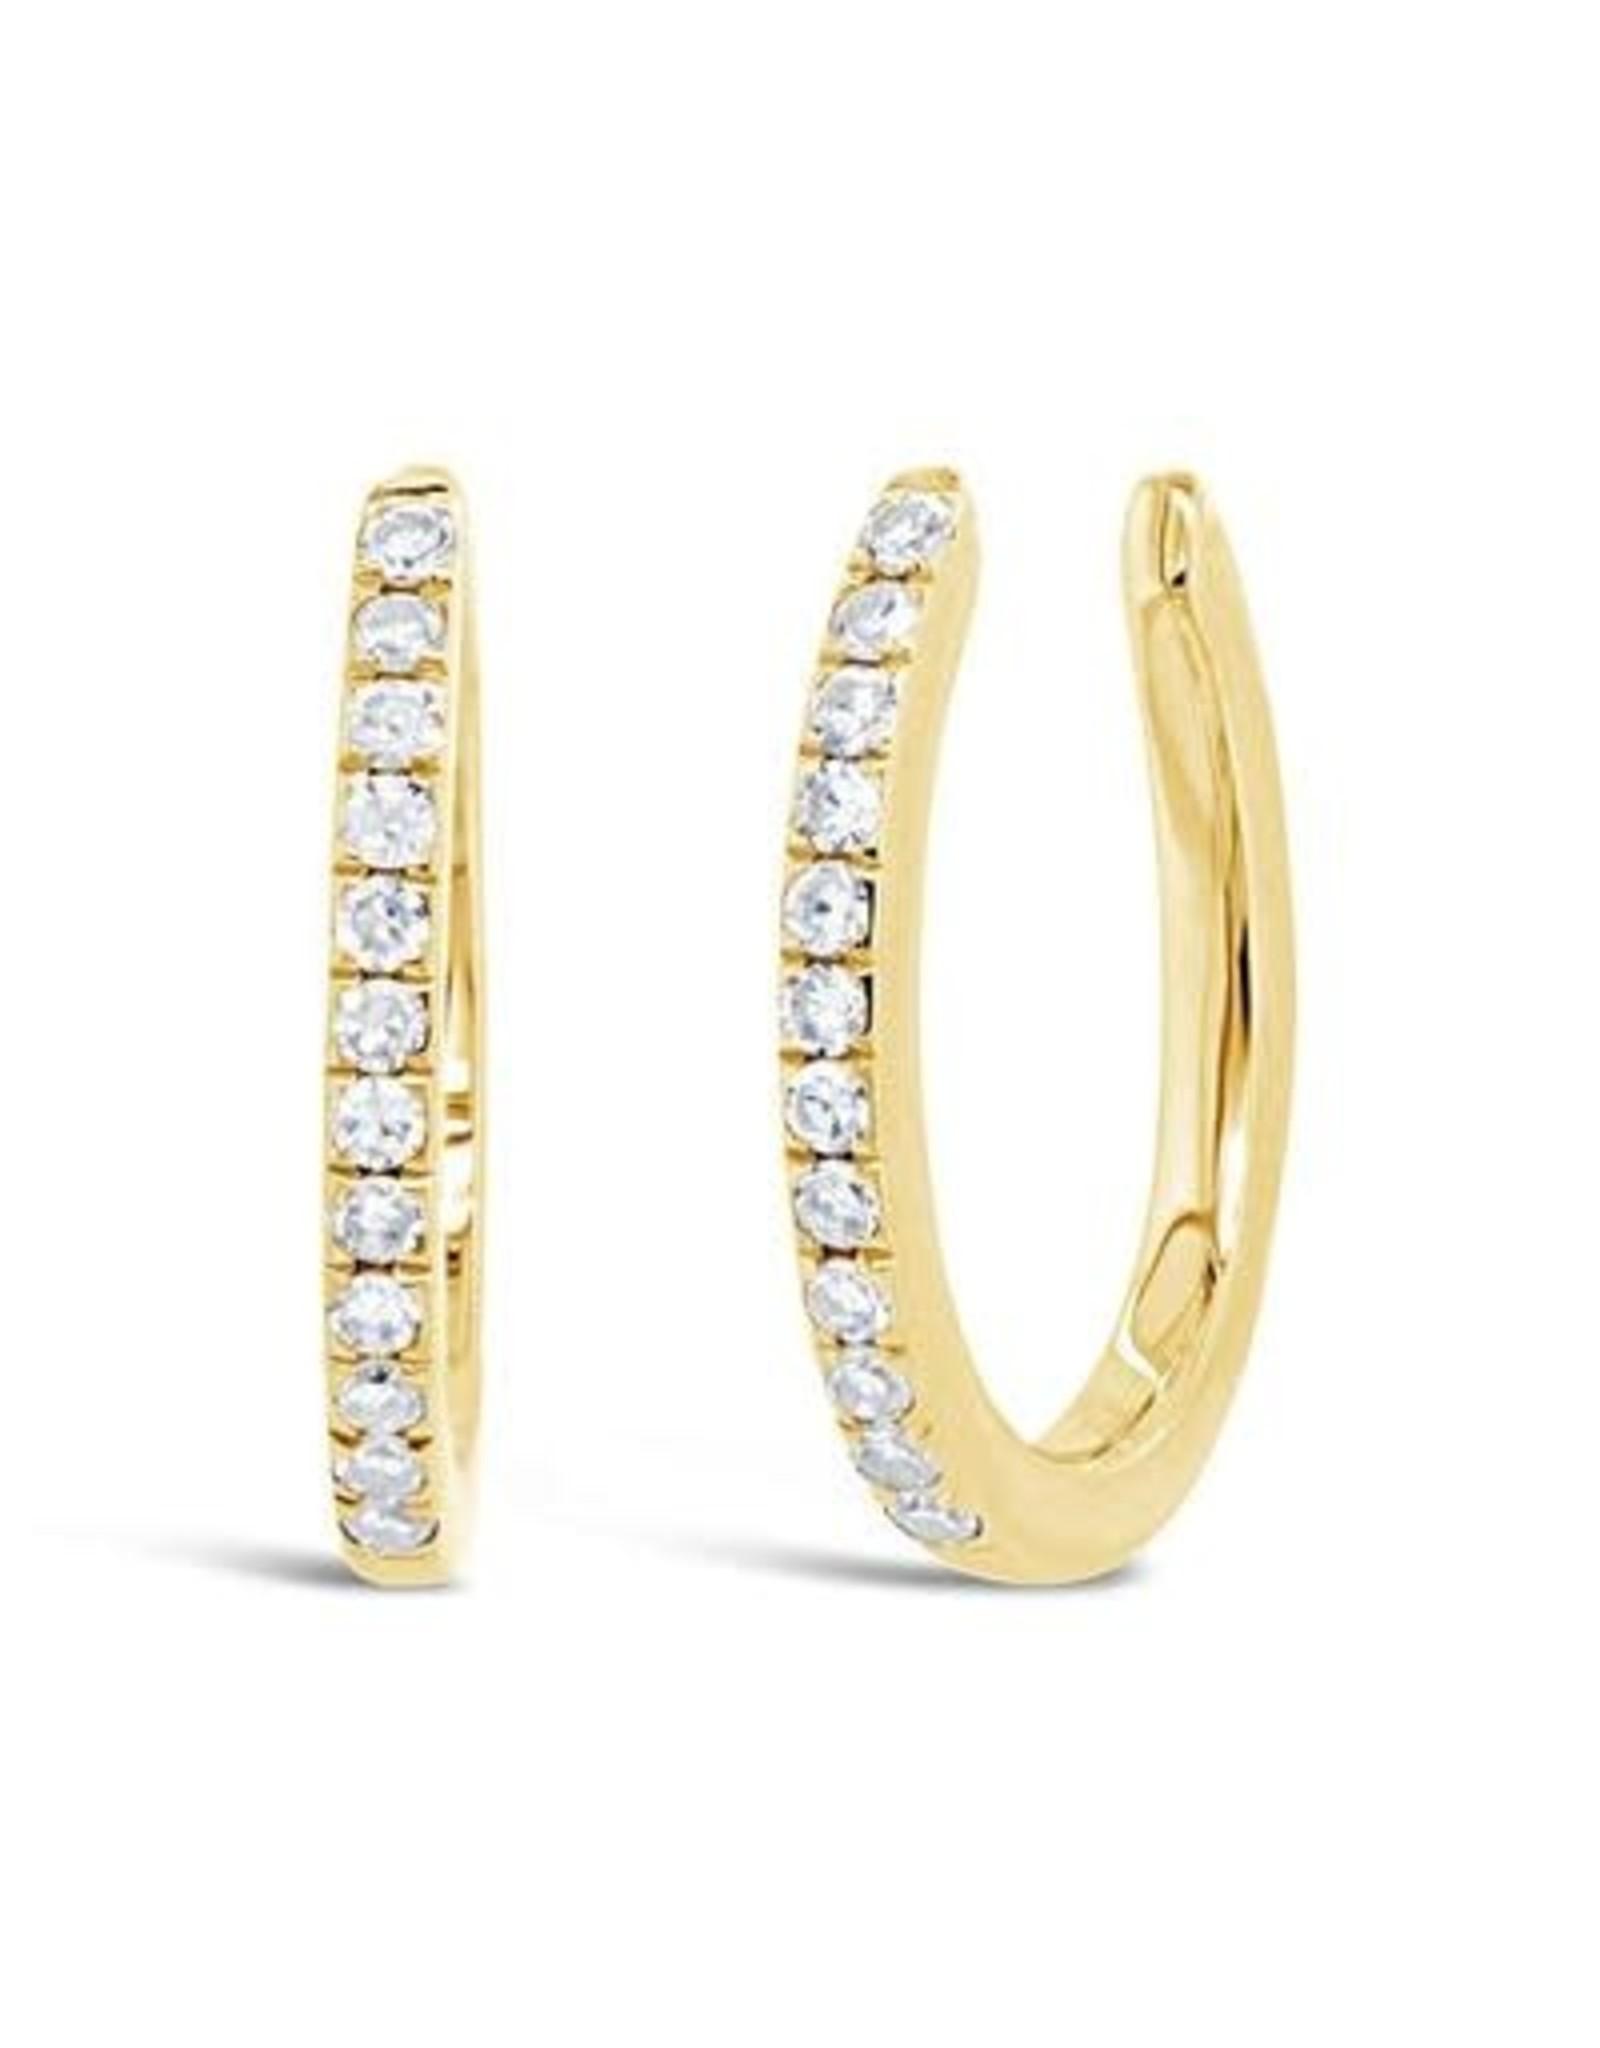 14K Yellow Gold Diamond Earring Cuffs, D: 0.09ct